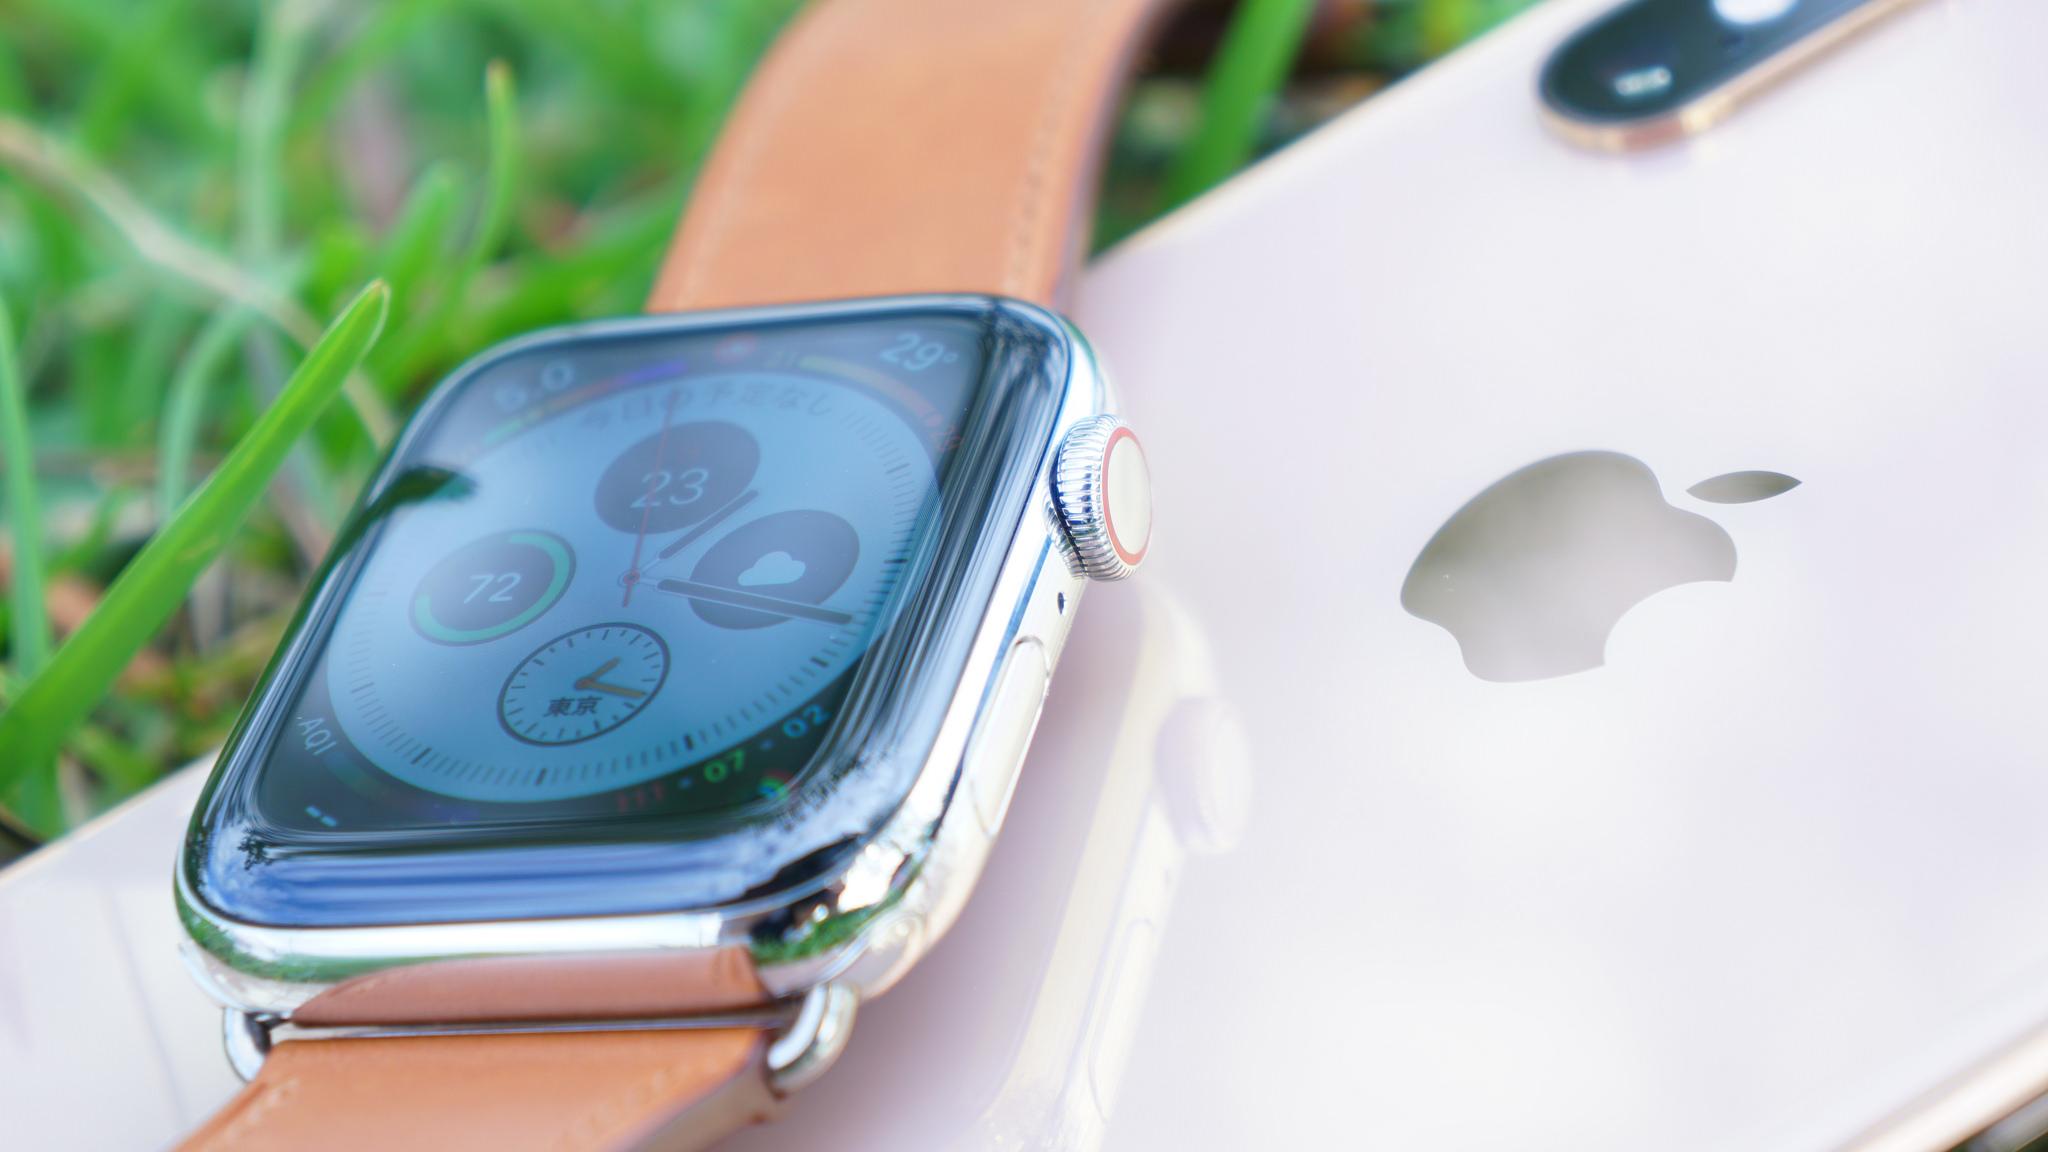 iPhone 11は簡易的な「AirPower」にもなる?Apple Watch・AirPodsの無線充電に対応の噂